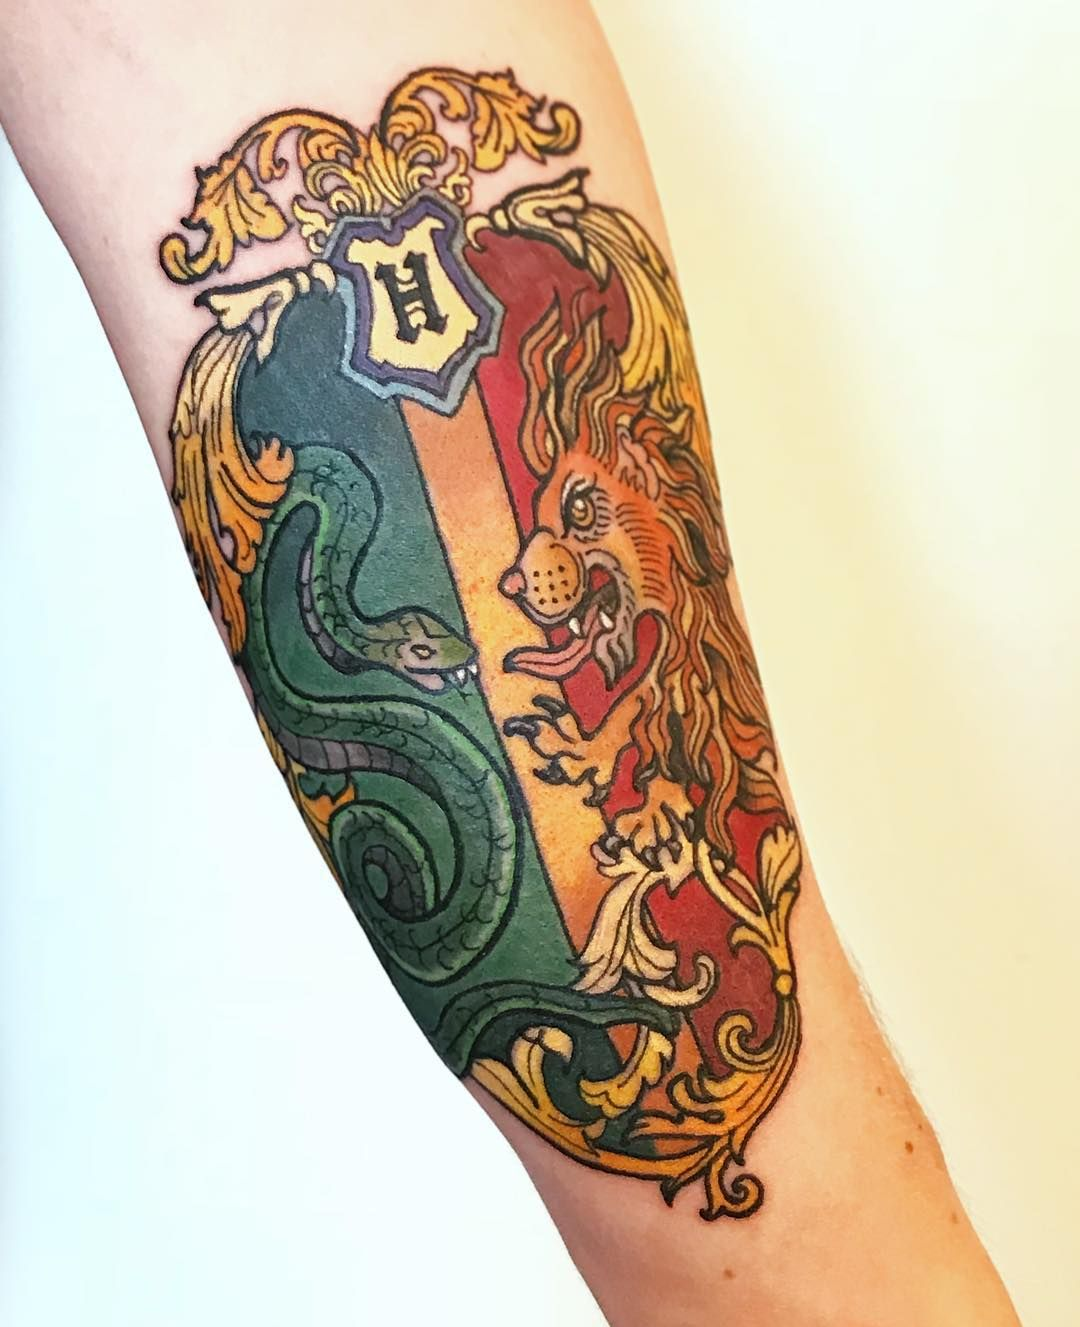 35 Enchanting Harry Potter Tattoos Slytherin Tattoo Harry Potter Tattoos Tattoos